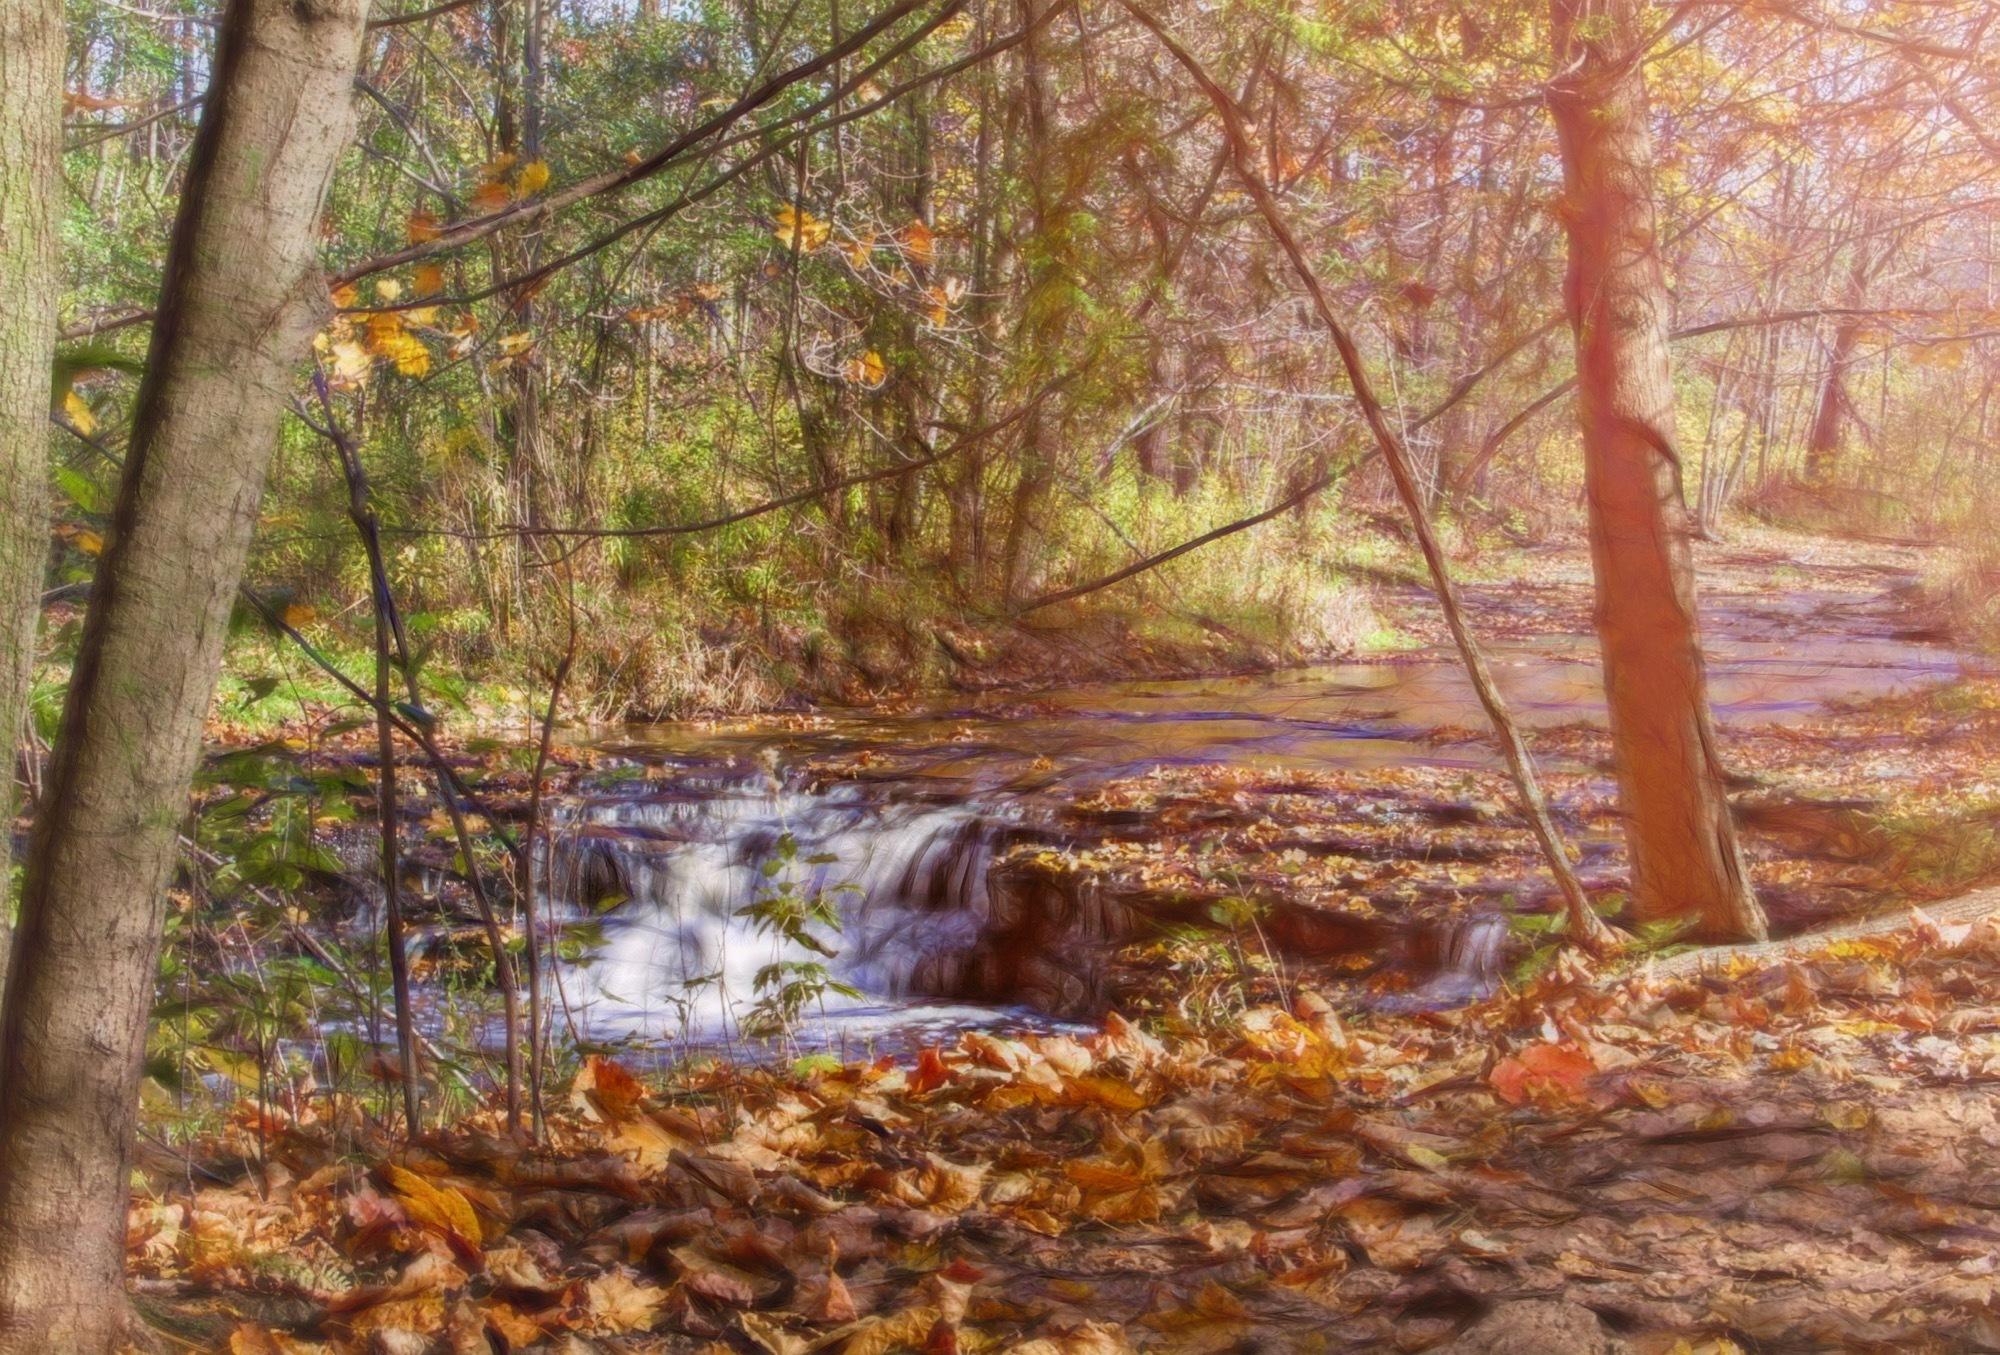 Nature's Palette by djensen